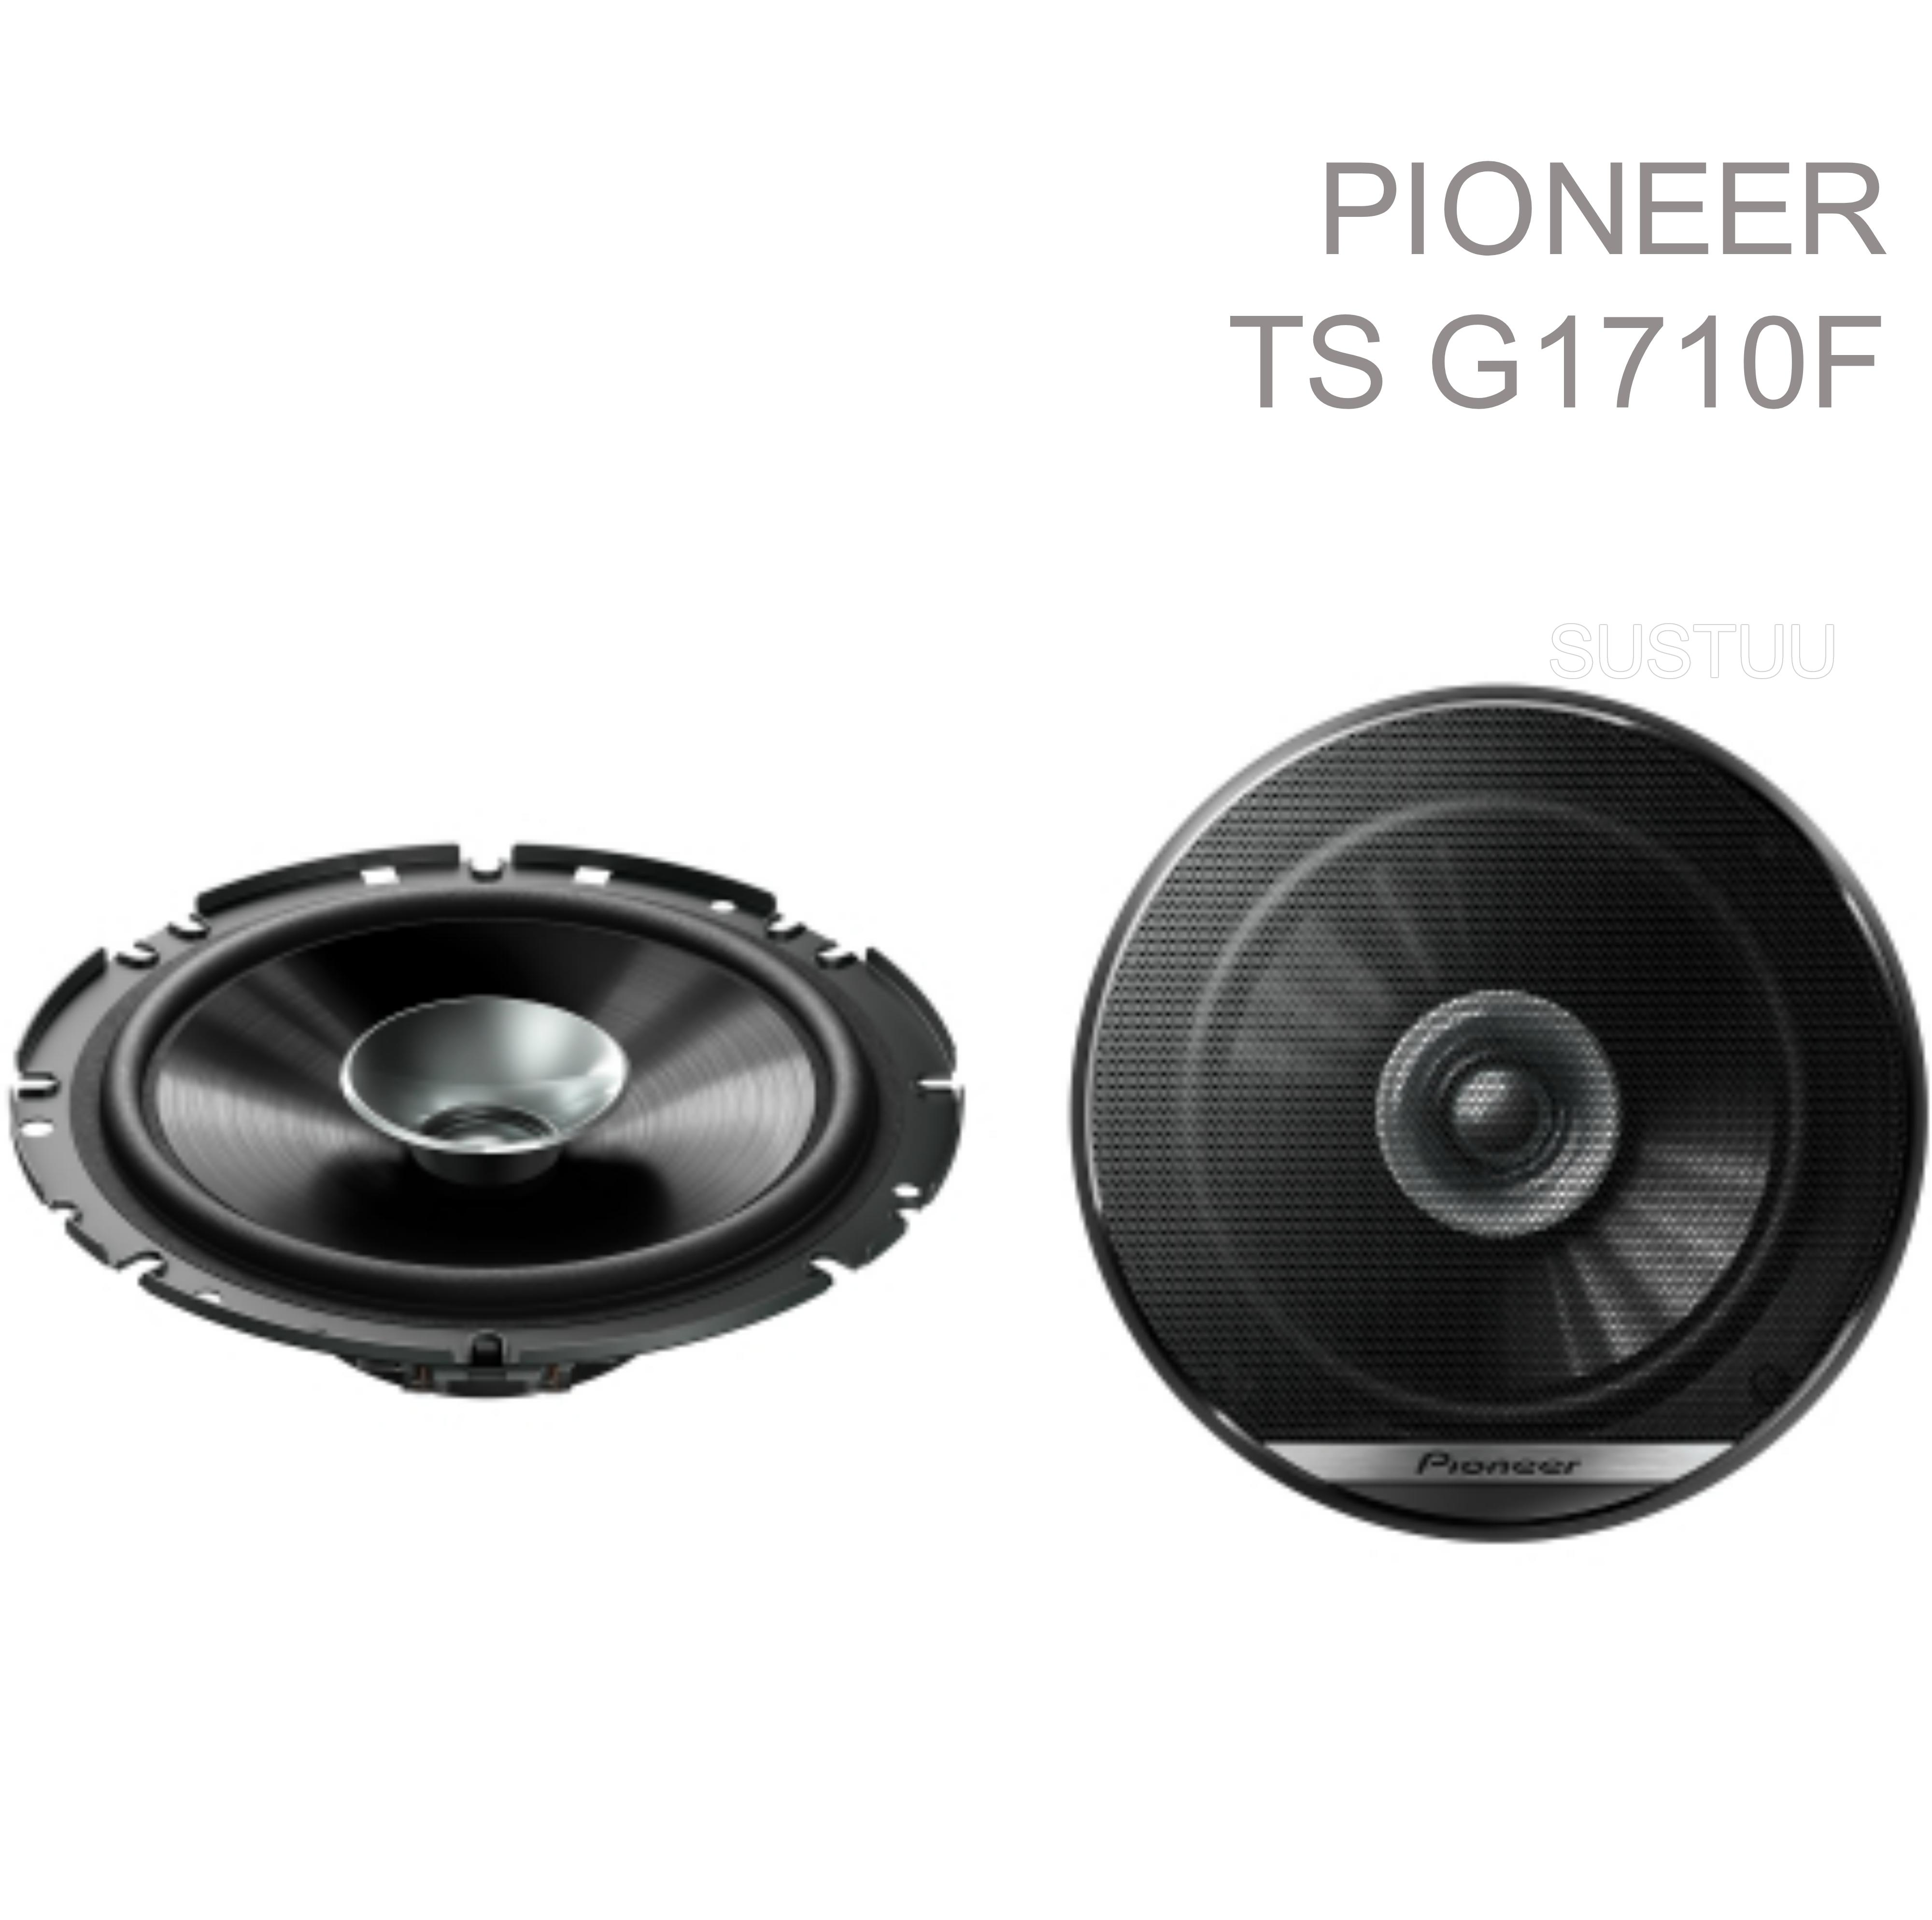 "Pioneer TS G1710F 6.5"" 280W 17Cm 2-Way Dual Cone Coaxial Car Door Speakers -NEW"